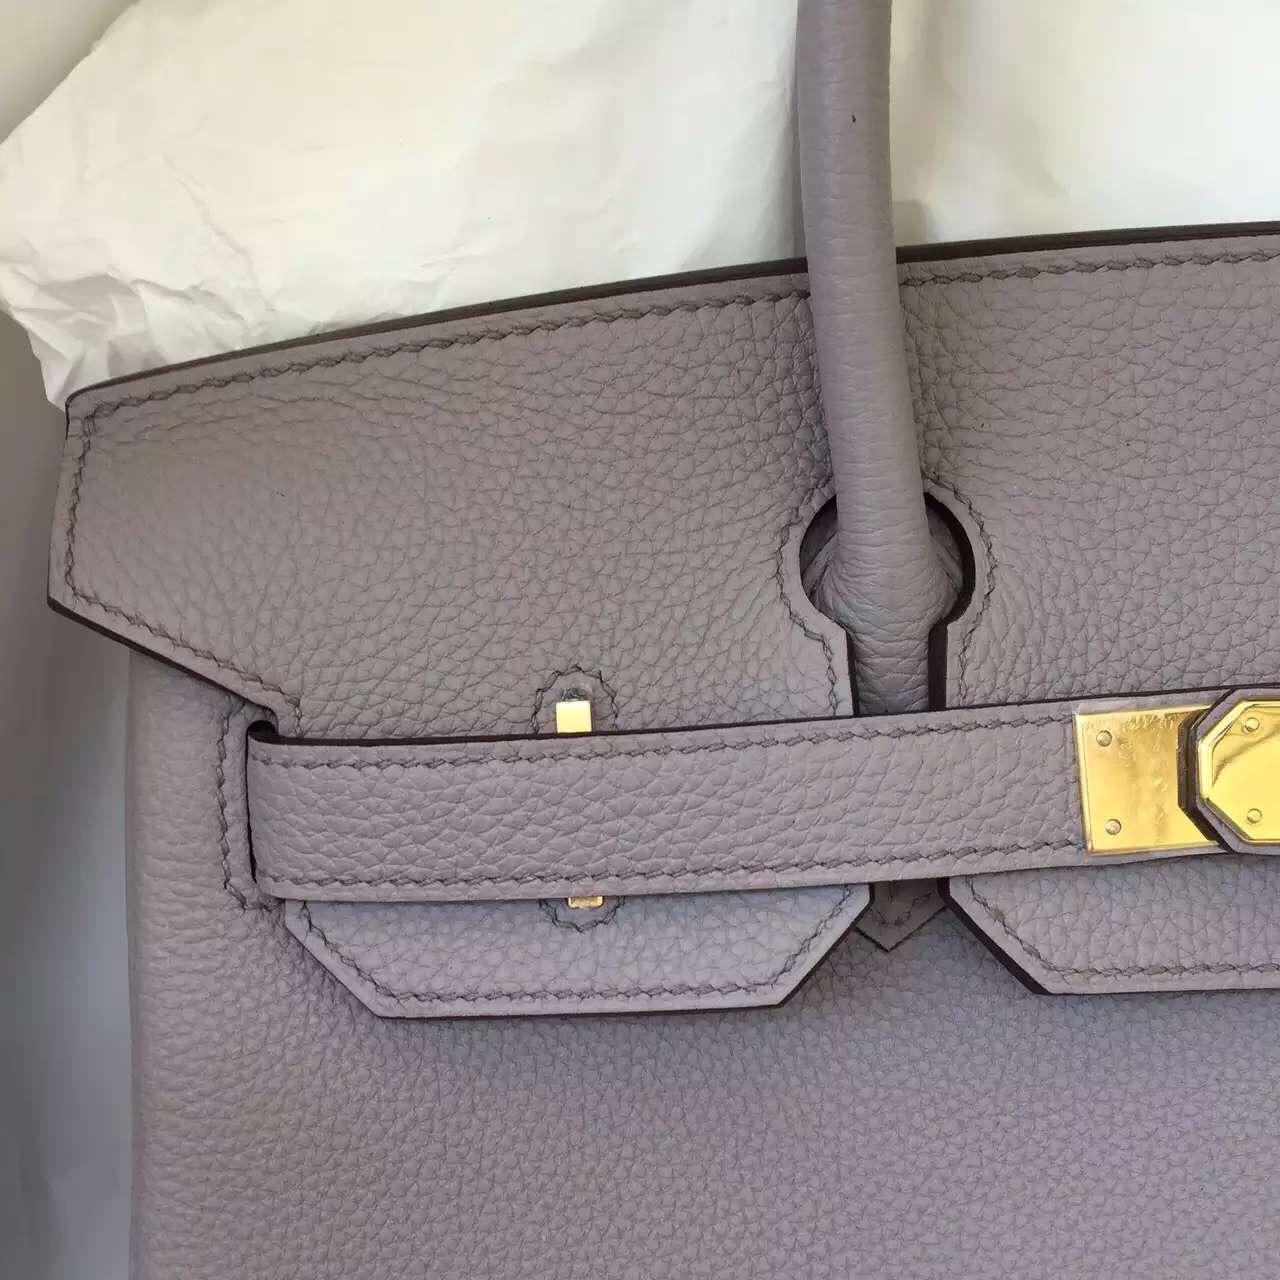 Hand Stitching Hermes Light Etain Grey Togo Leather Birkin Bag 30CM